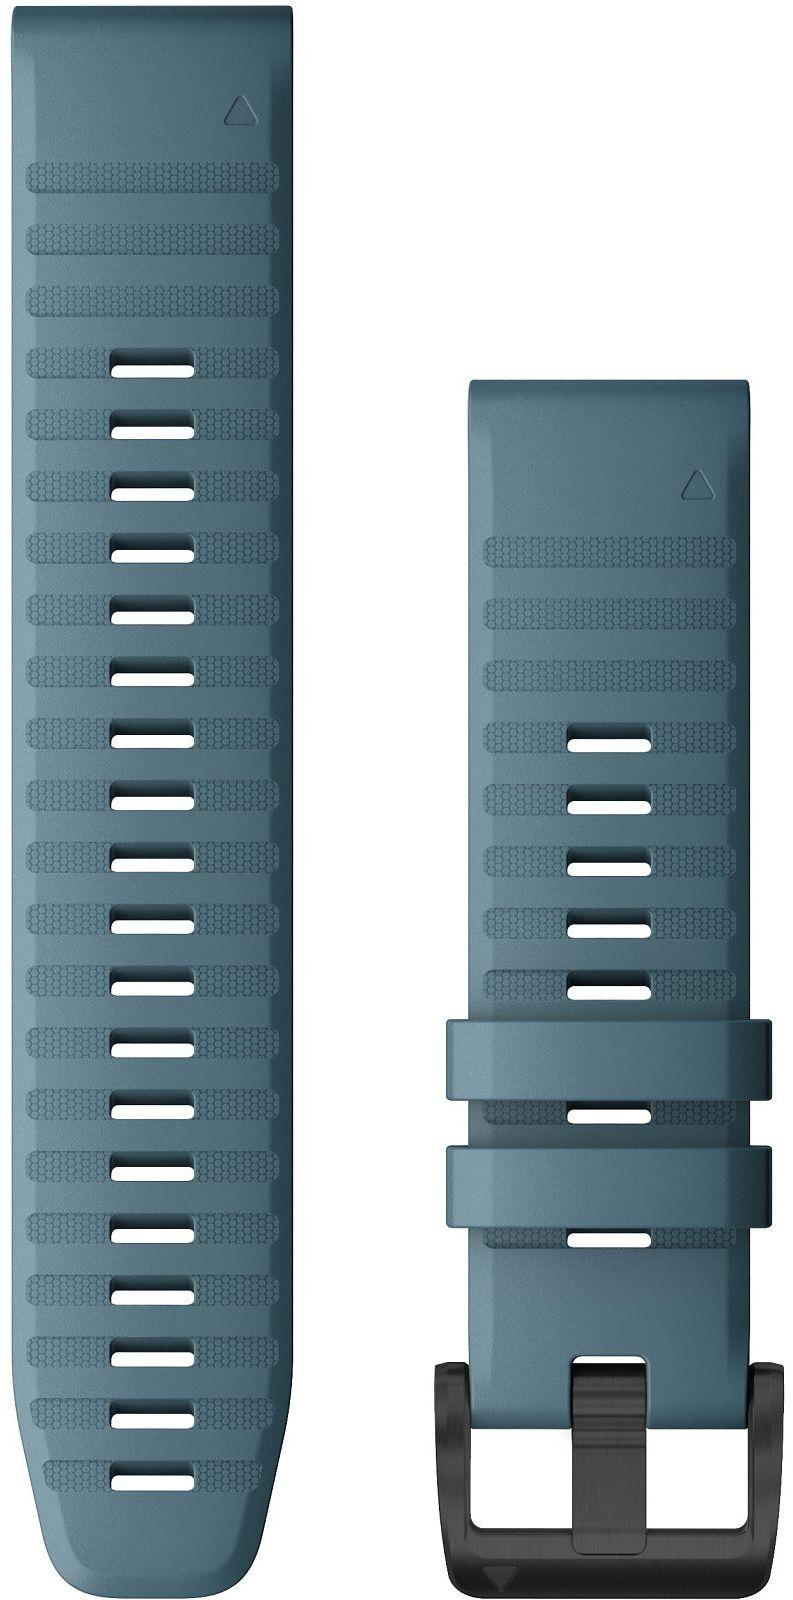 Pasek Garmin QuickFit  Fenix, Forerunner, Forerunner, Instinct, Quatrix, Marq, Approach oraz Delta 22 mm